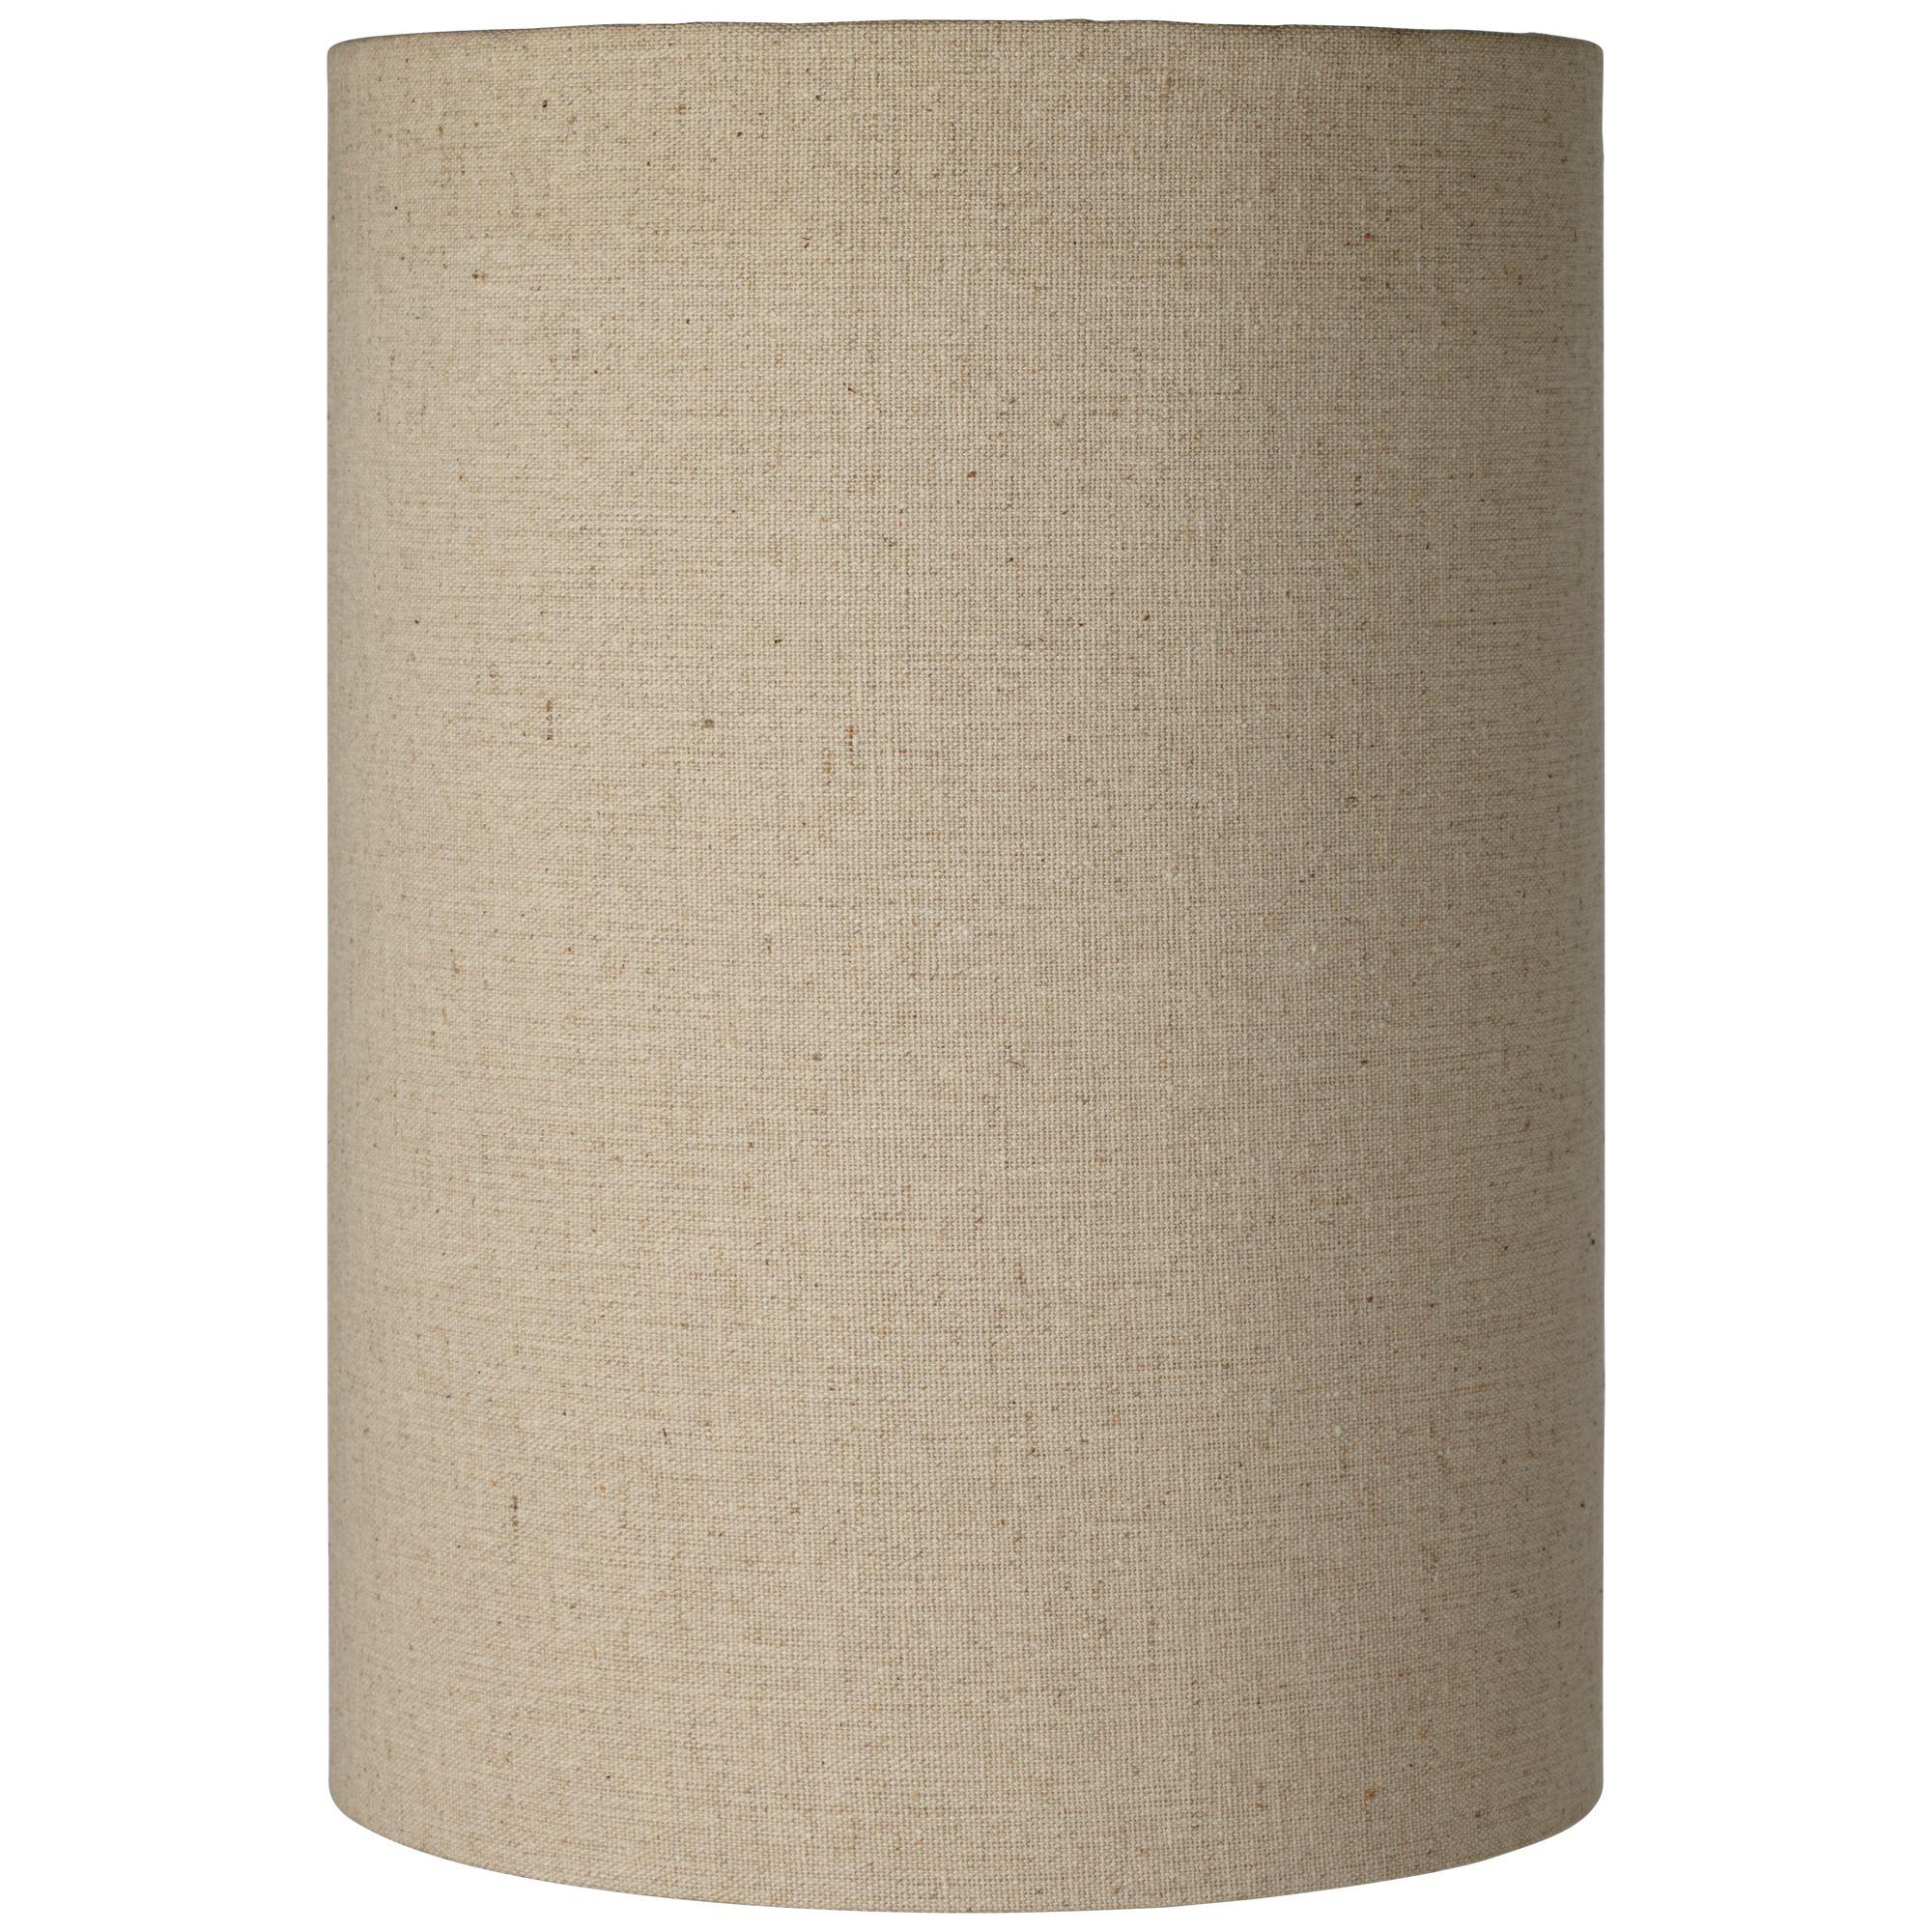 Brentwood Cotton Blend Tan Cylinder Shade 8x8x11 (Spider)